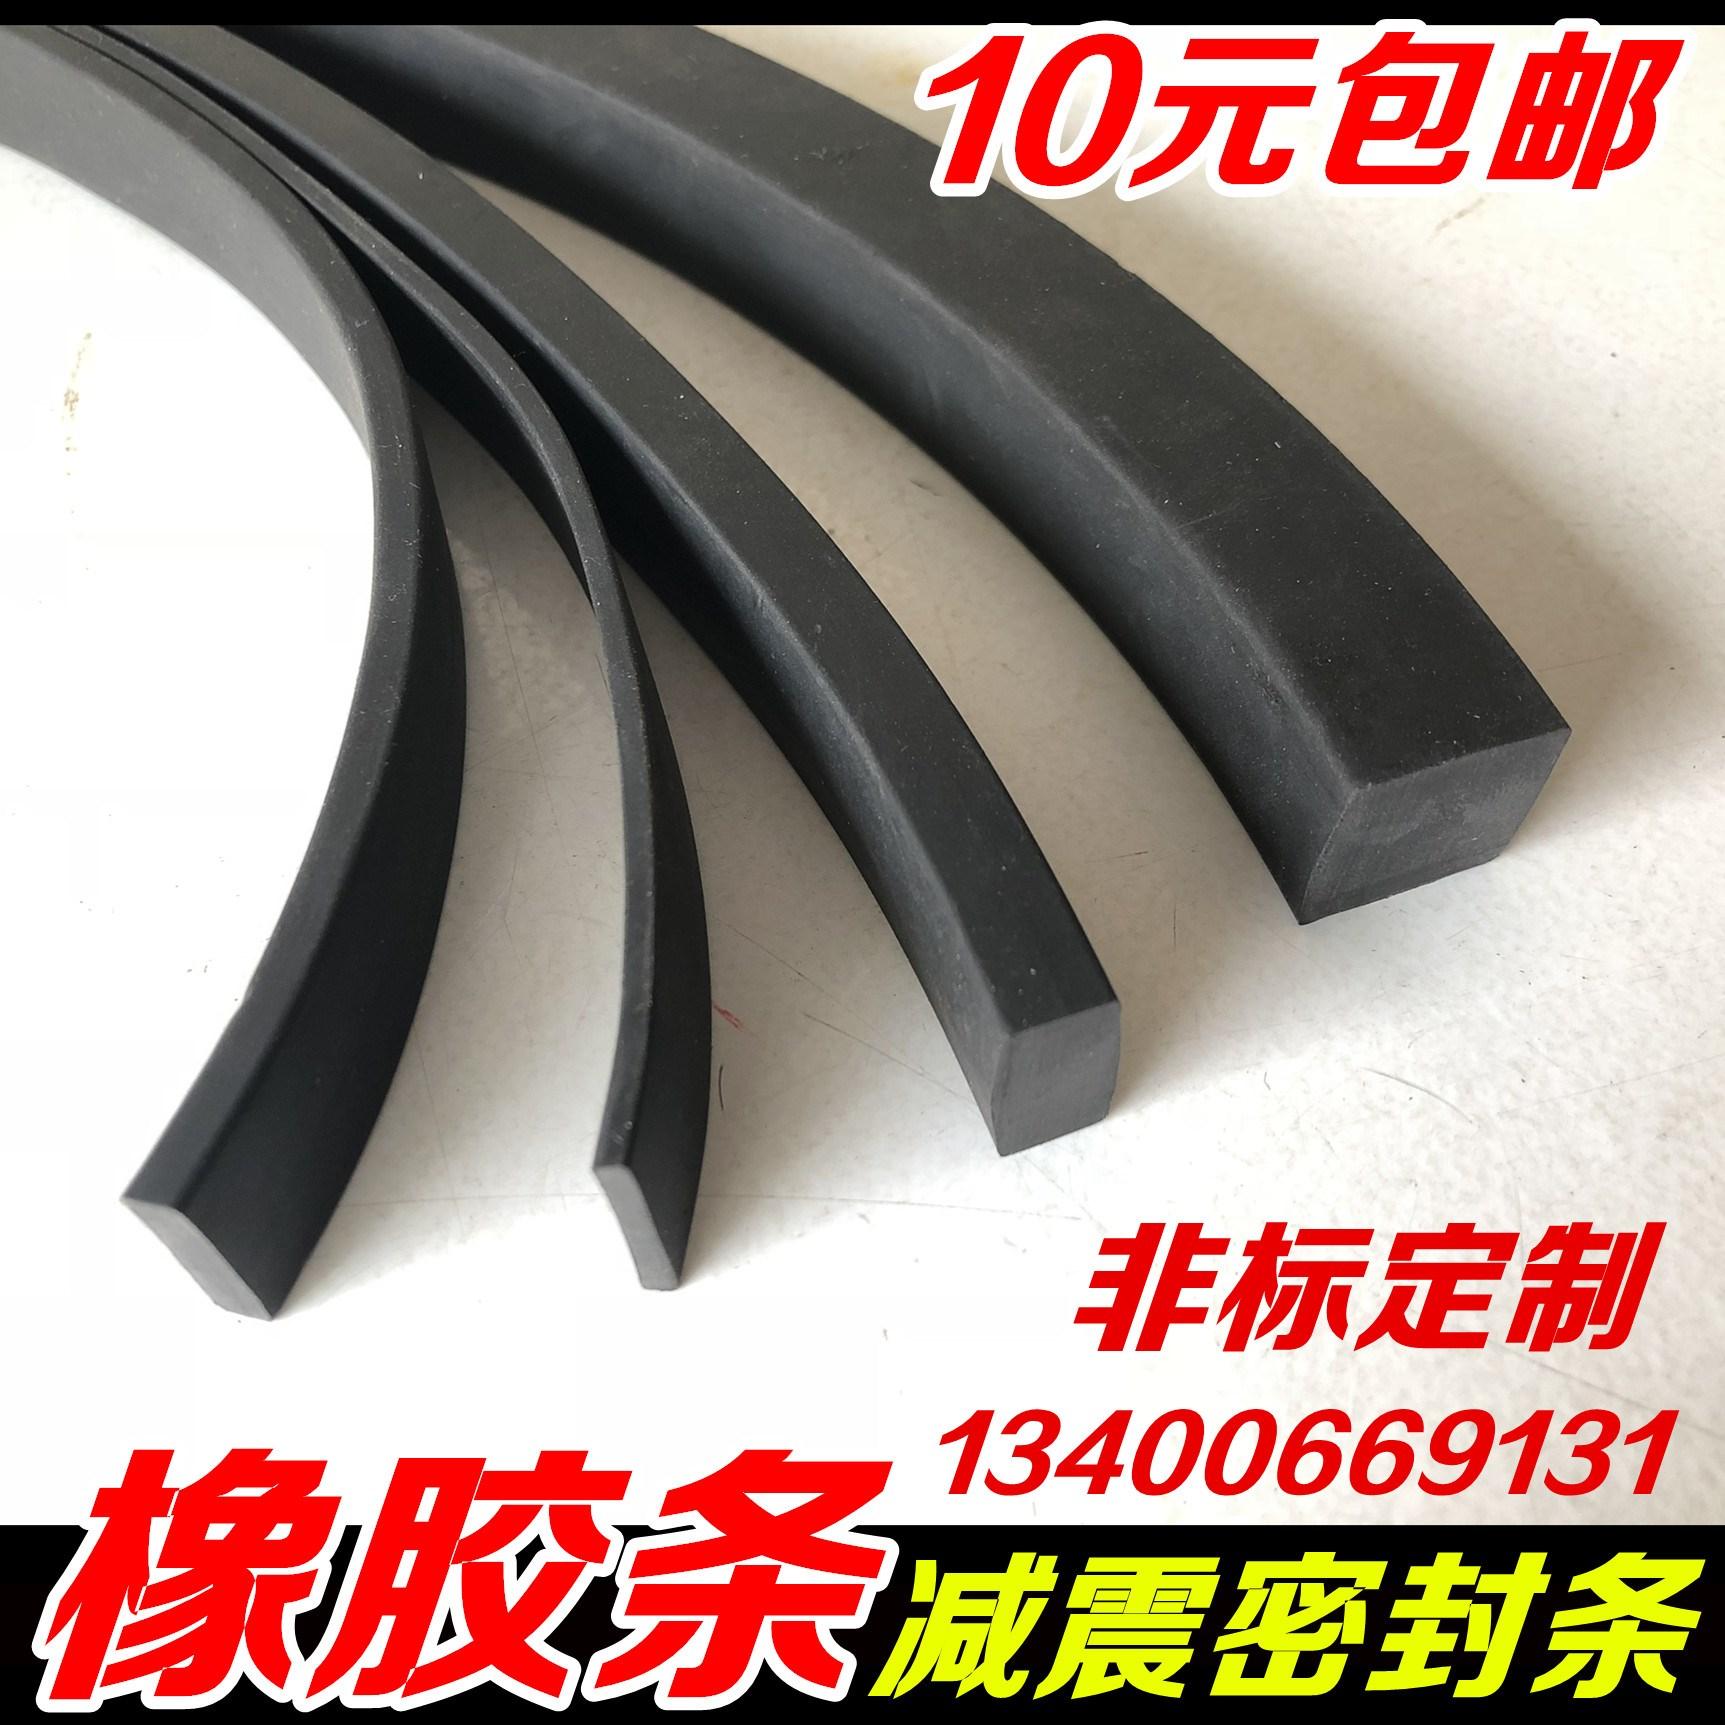 3m耐油橡胶条扁条实心方条钢化玻璃减震缓冲垫NBR密封条3/5/10MM